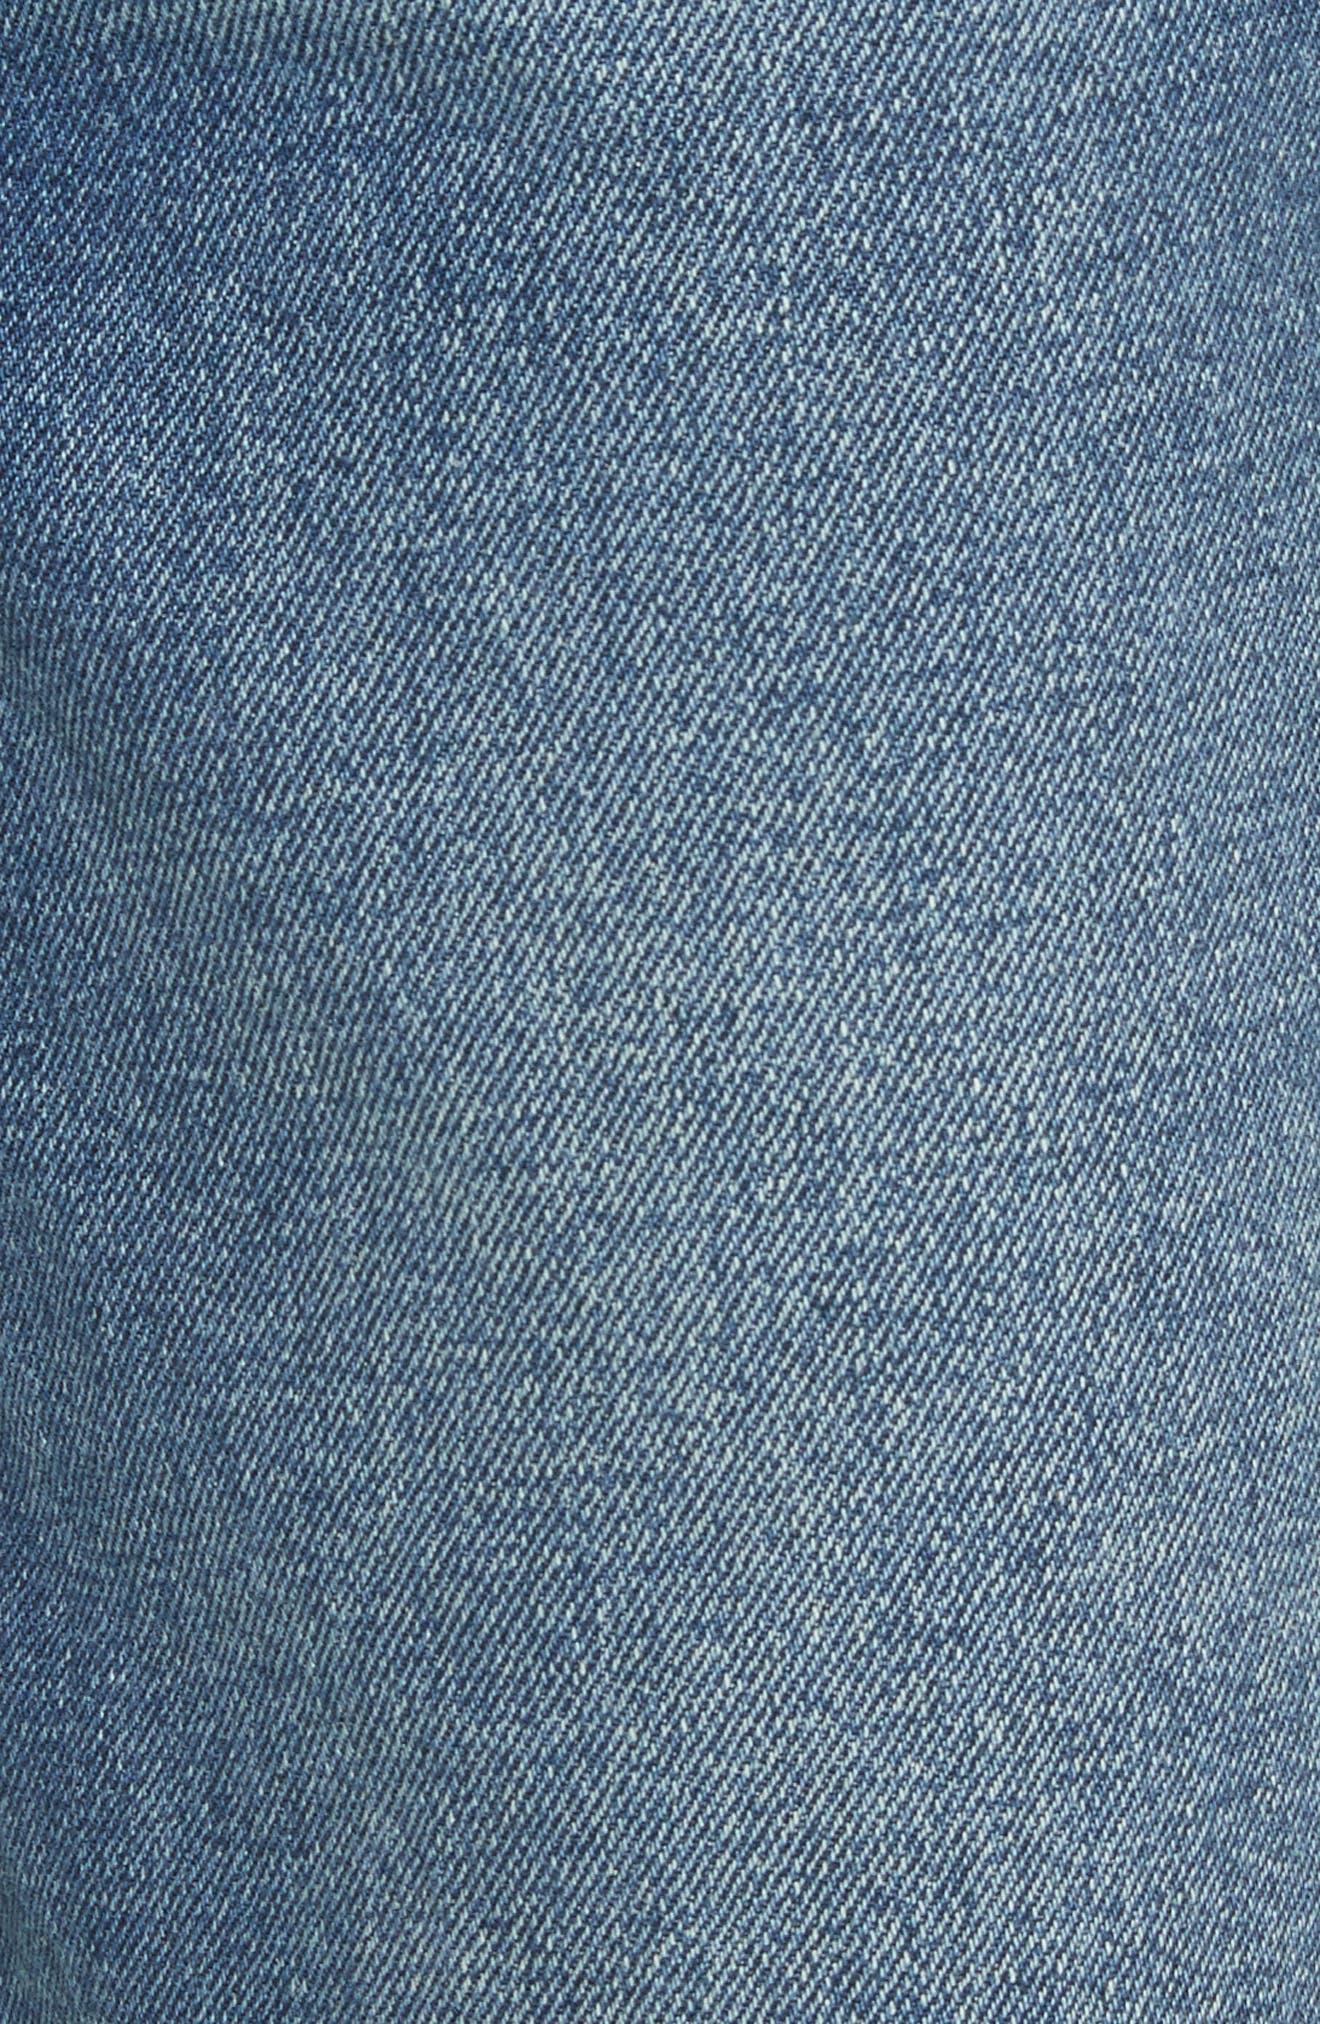 Alternate Image 5  - GRLFRND Helena Rigid High Waist Straight Jeans (Close To You)